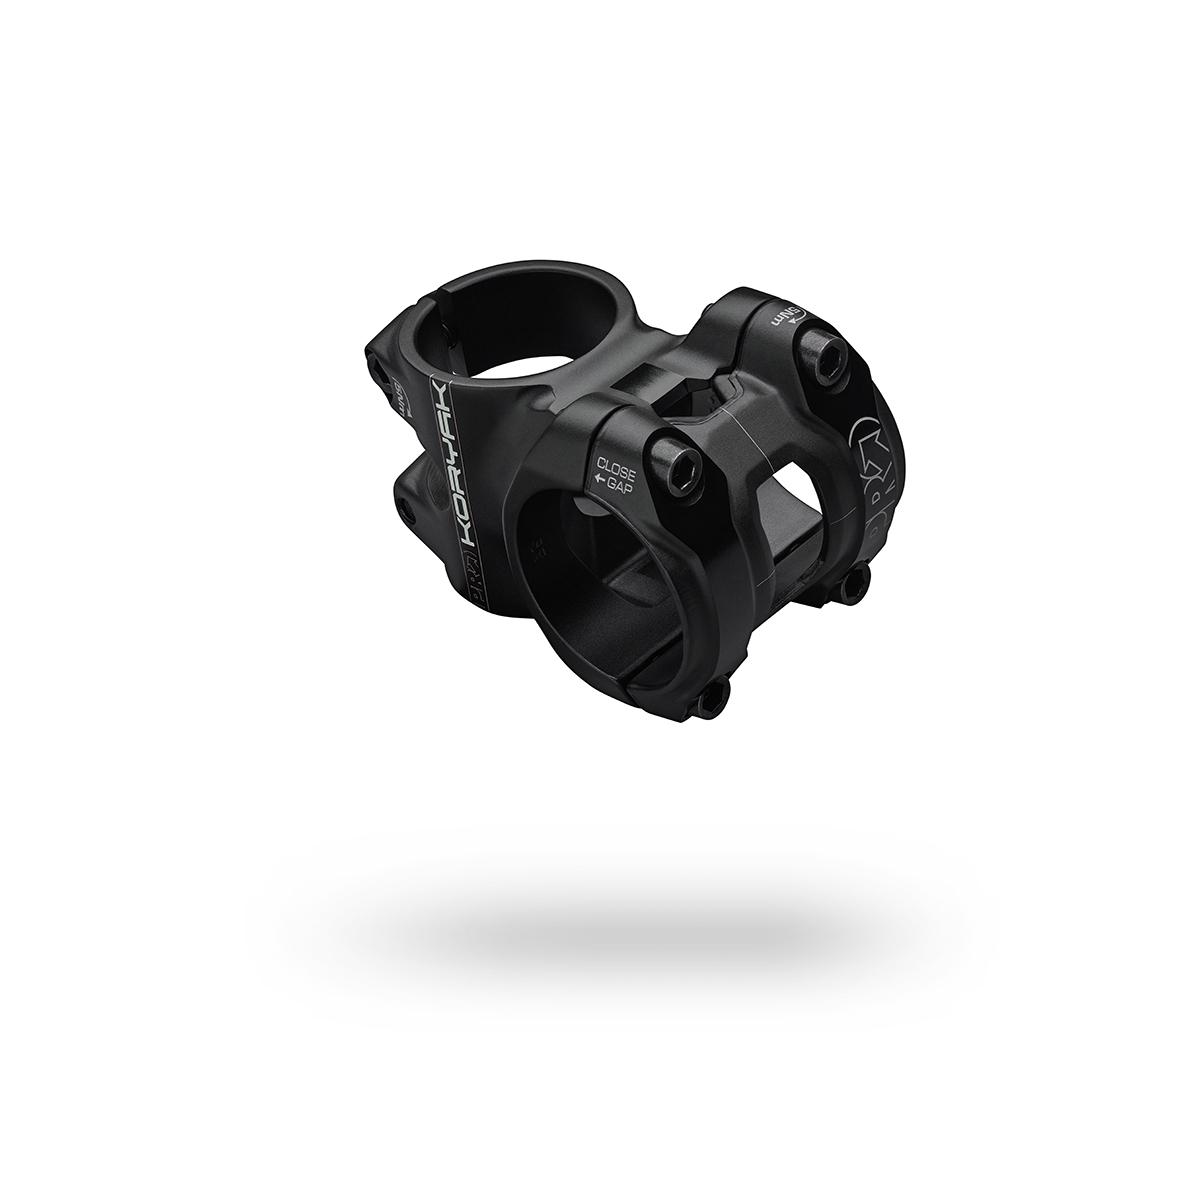 Stem Koryak 31.8mm x 40mm 0° Black